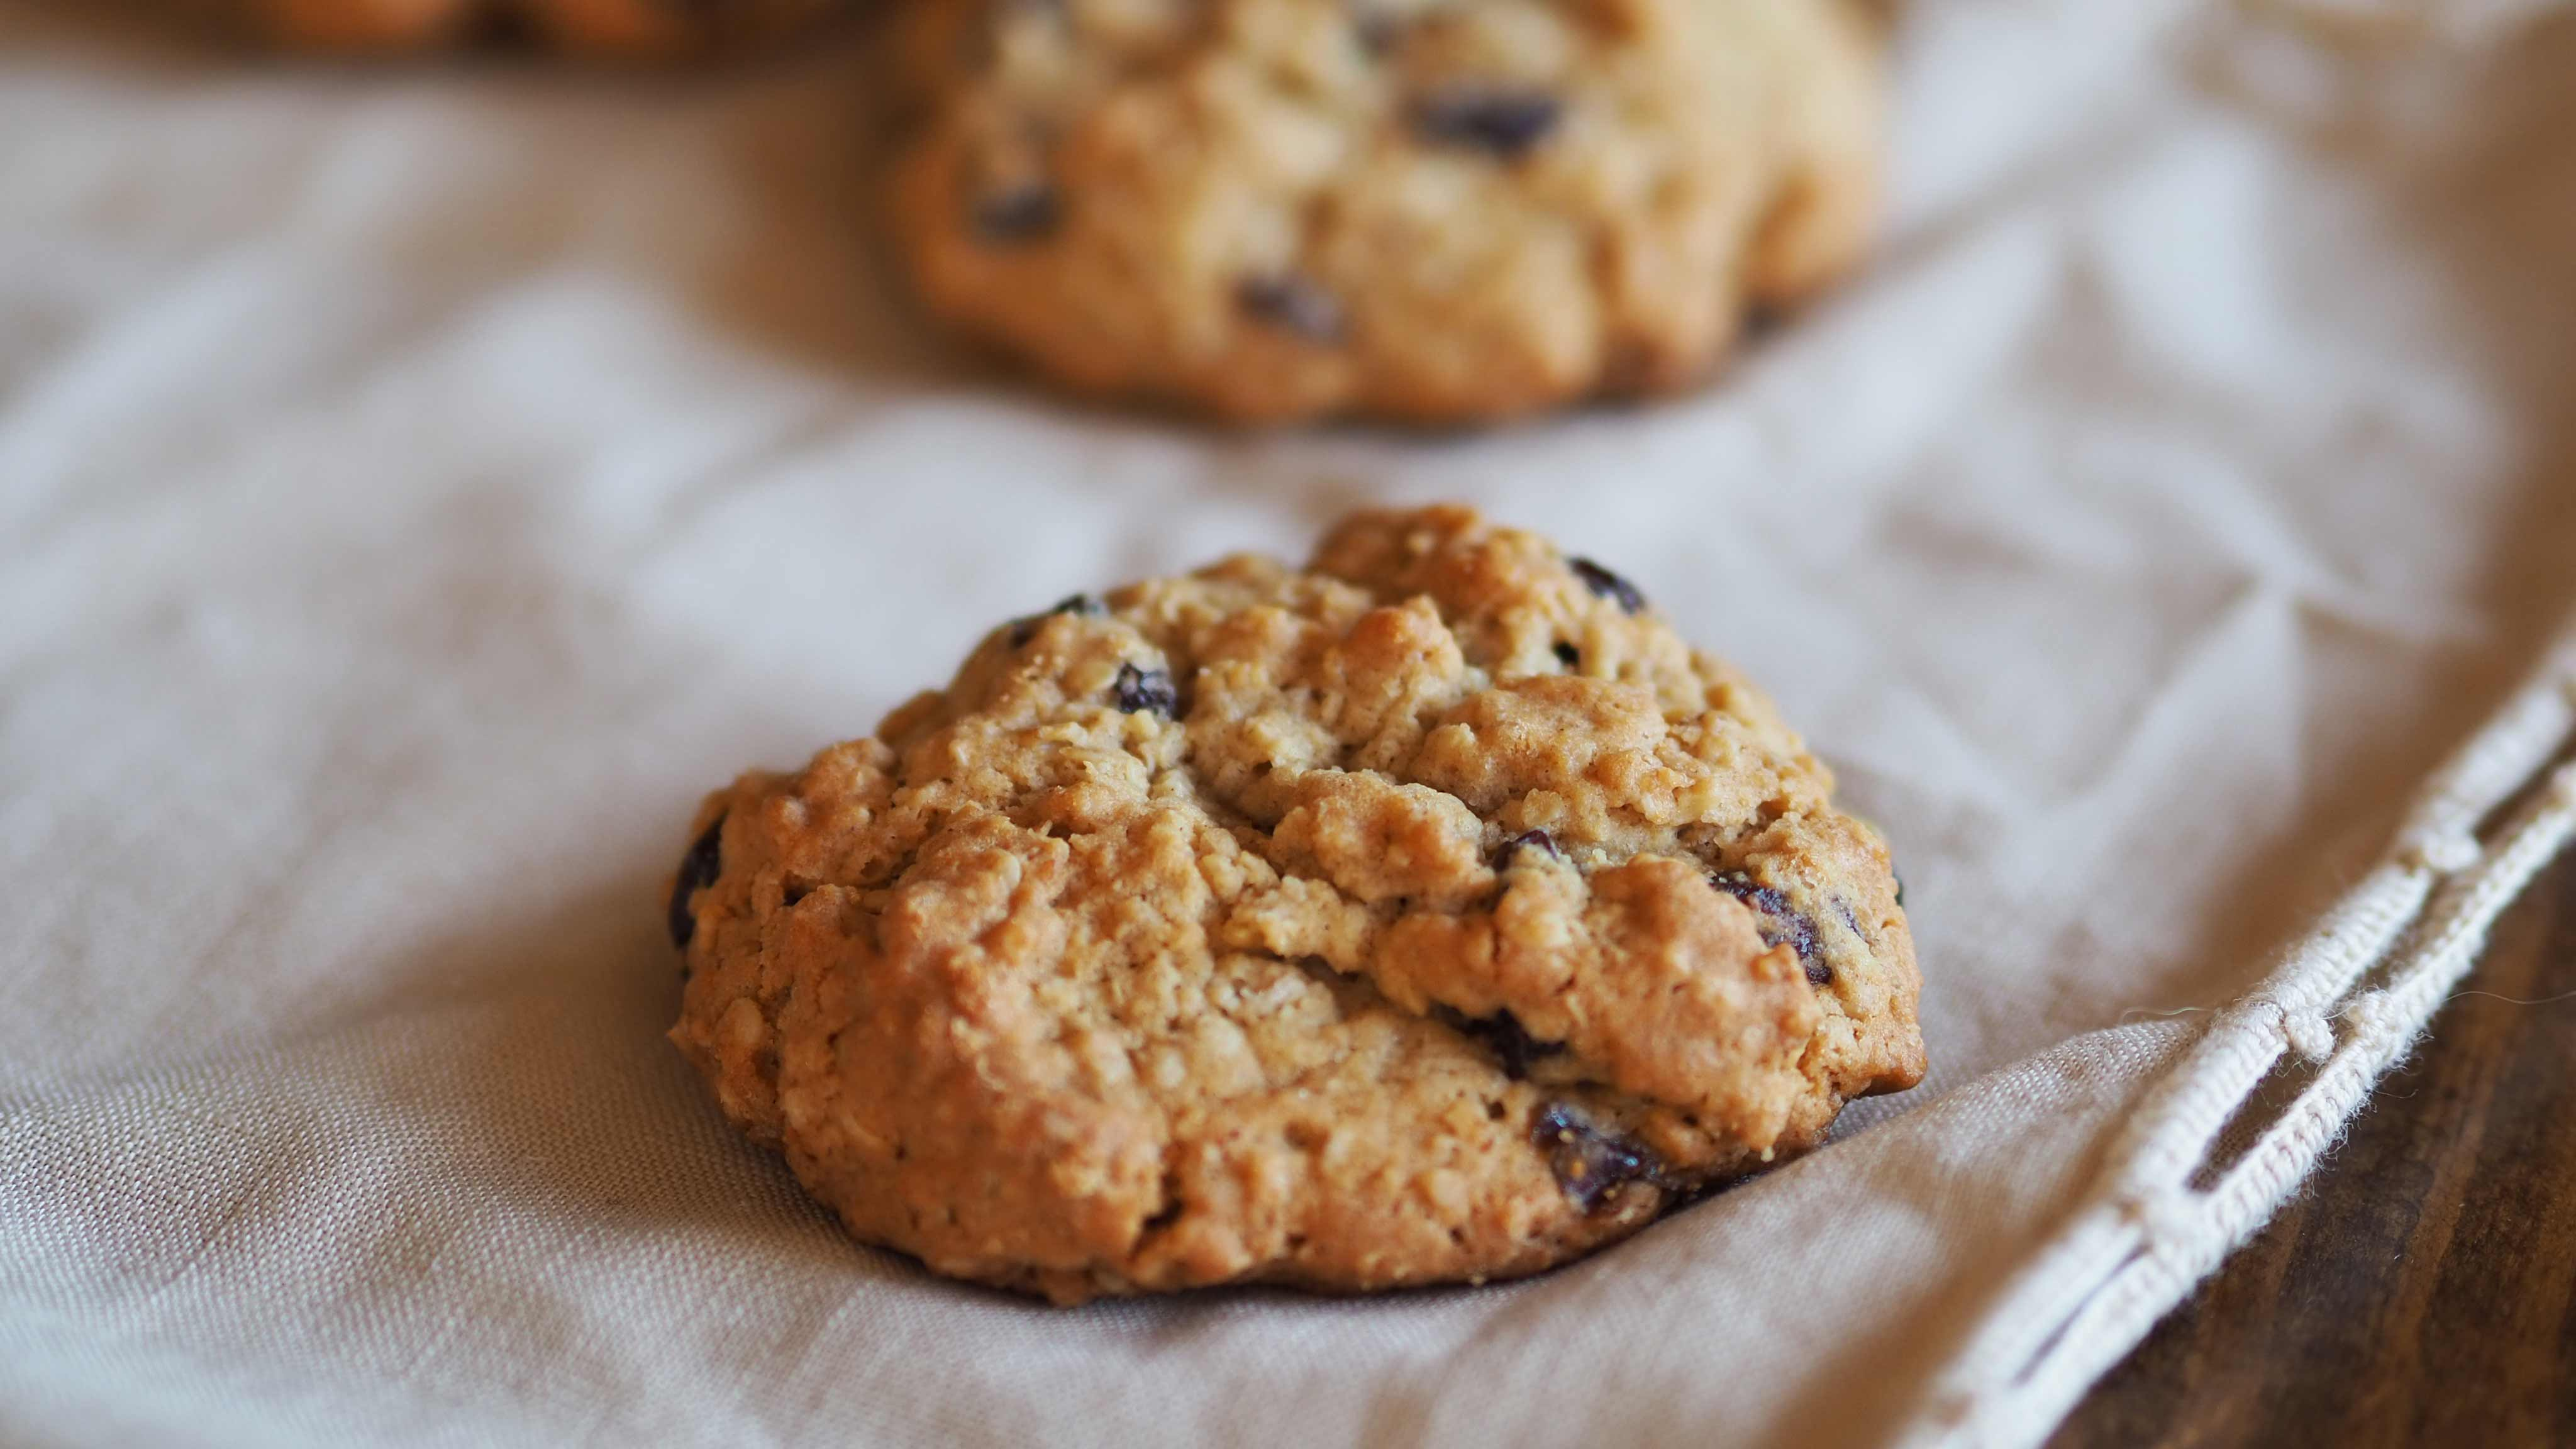 Image for Recipe Oatmeal Raisin Cookies